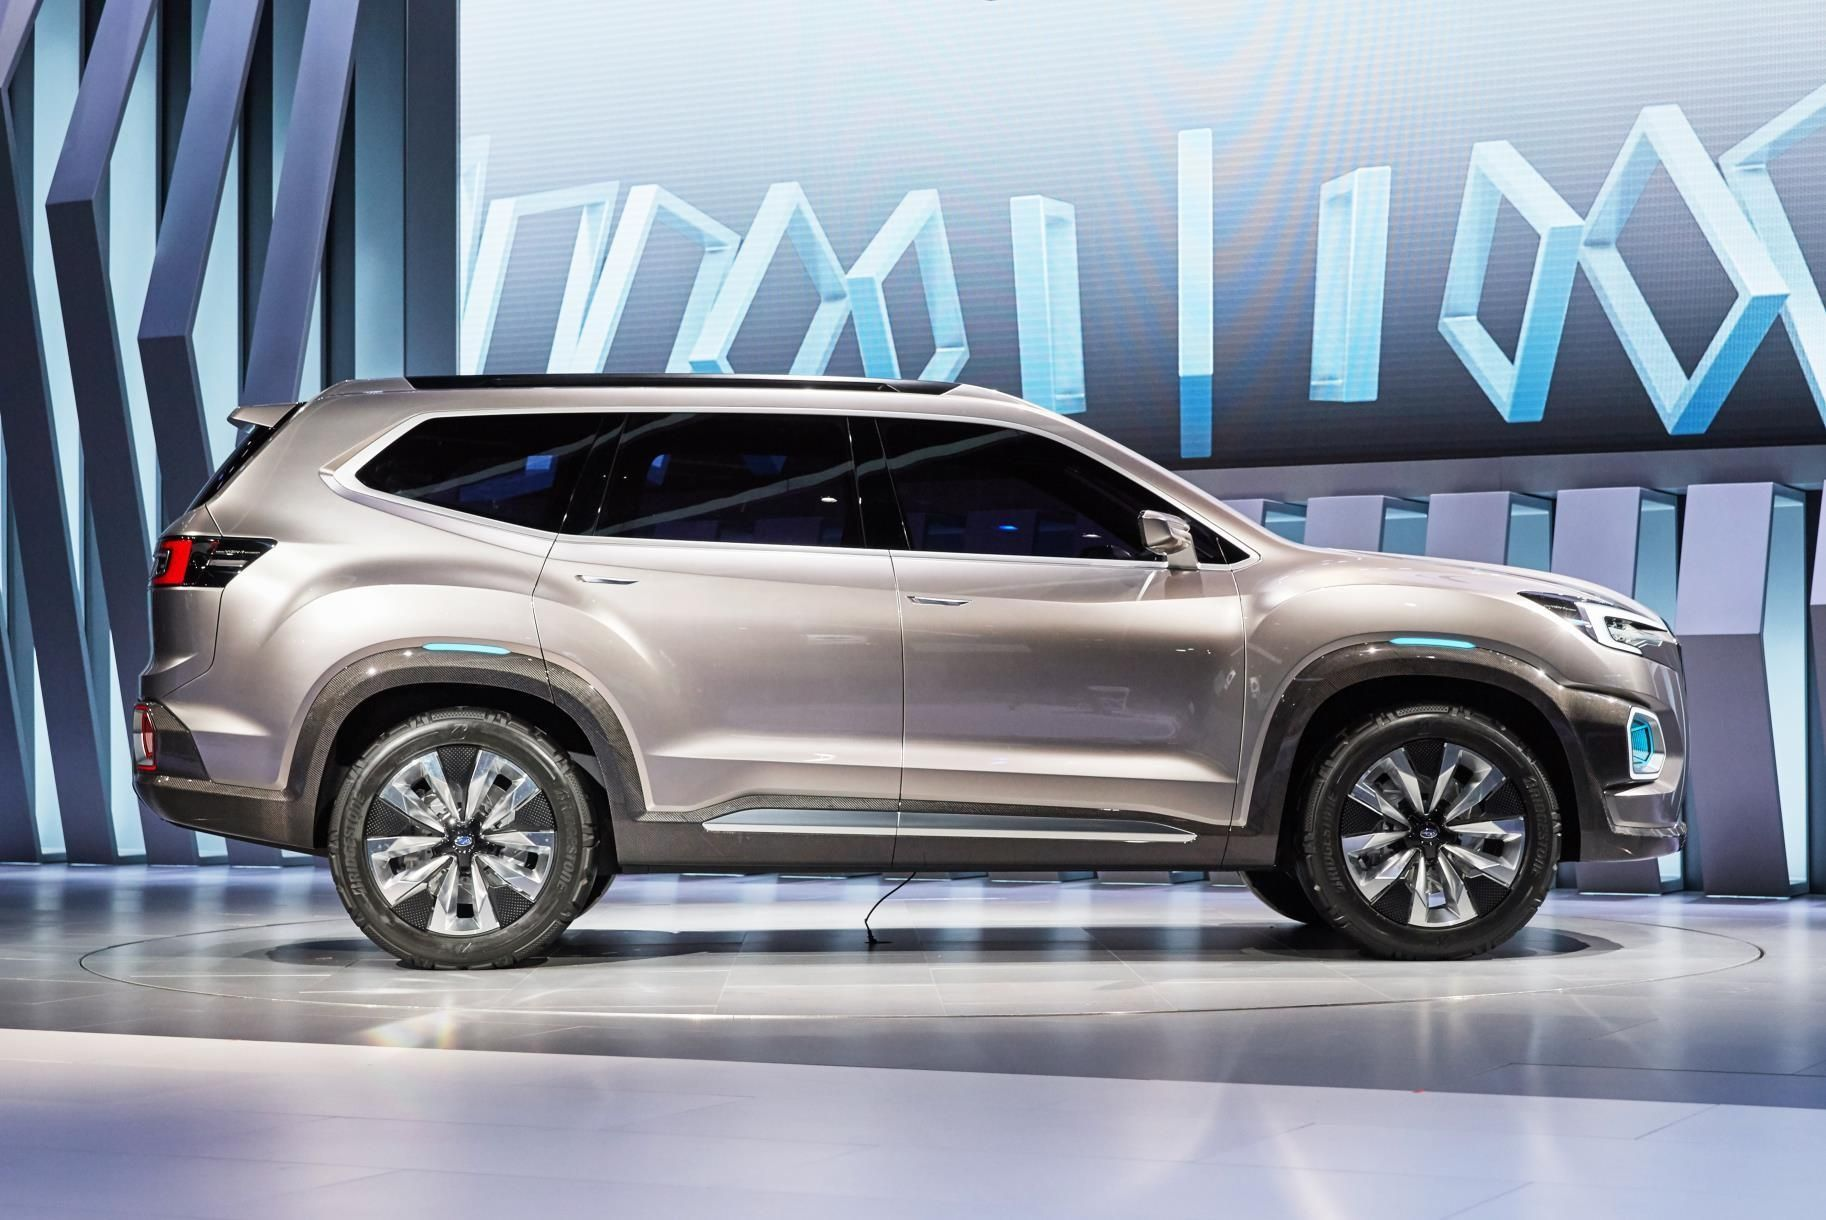 2019 Subaru Tribeca Mid Size 7 Seat Suv Previewedviziv Throughout Exterior